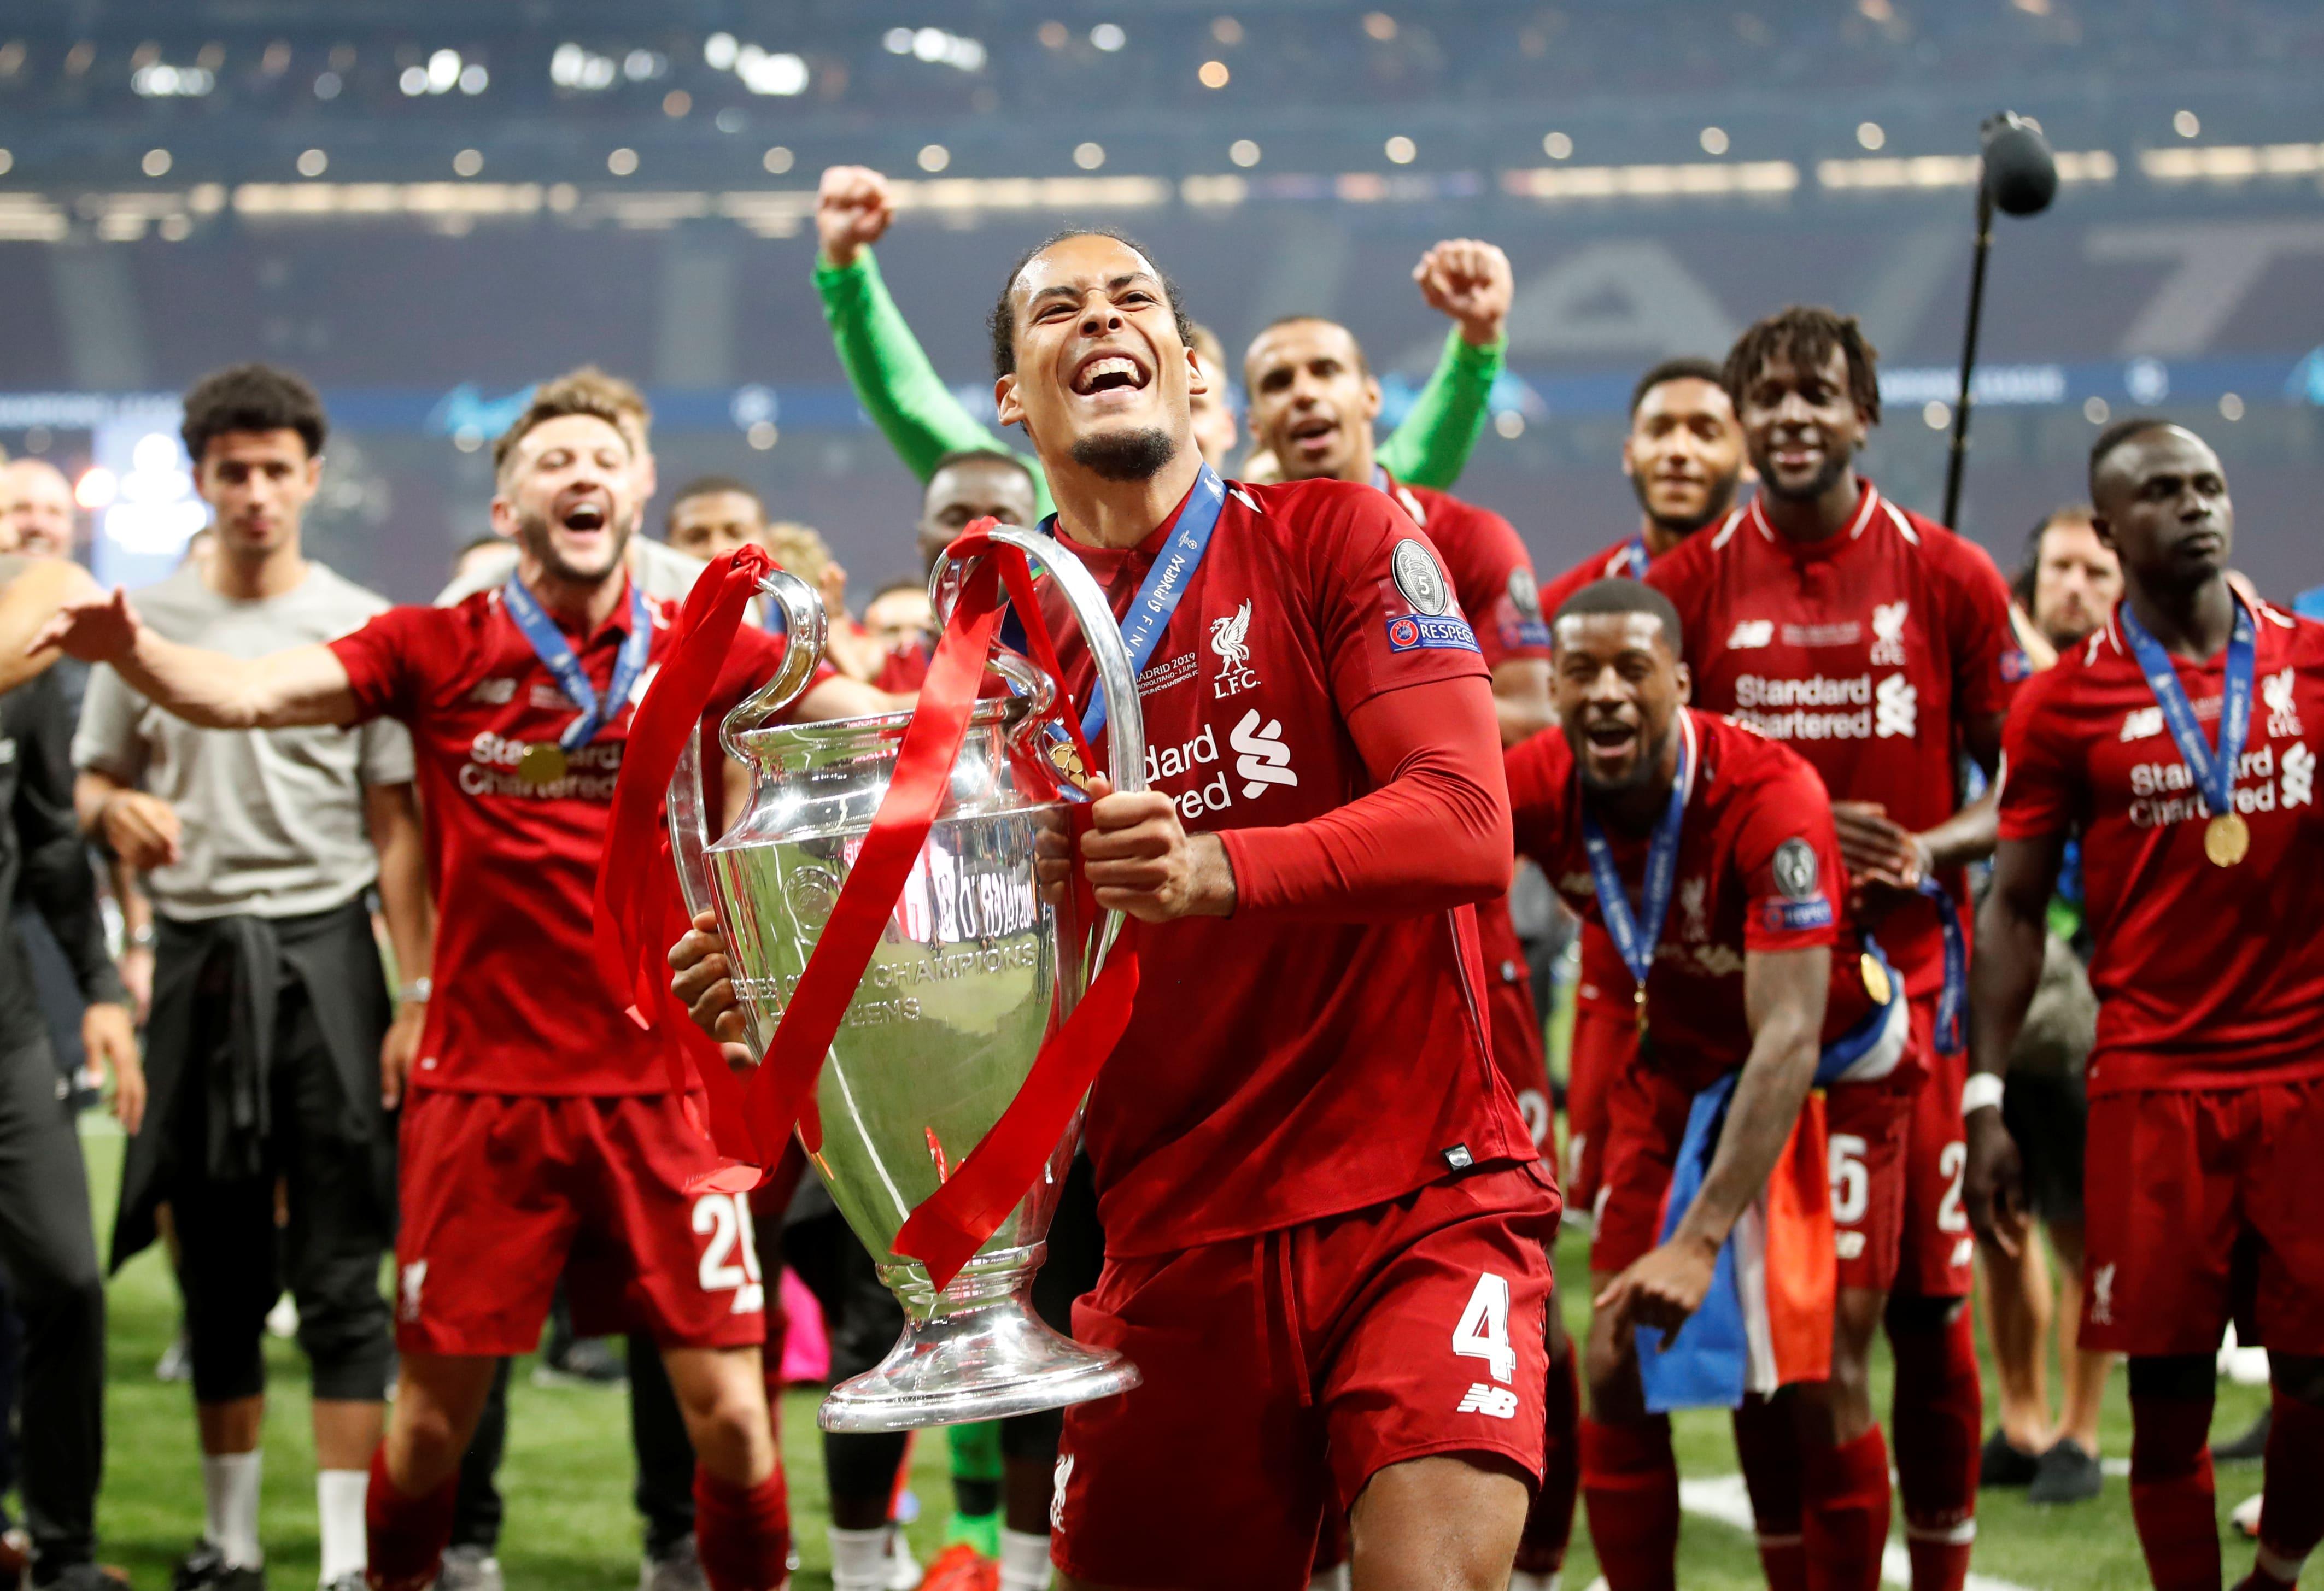 FIFA Ballon d'Or 2019 winner - Award predictions